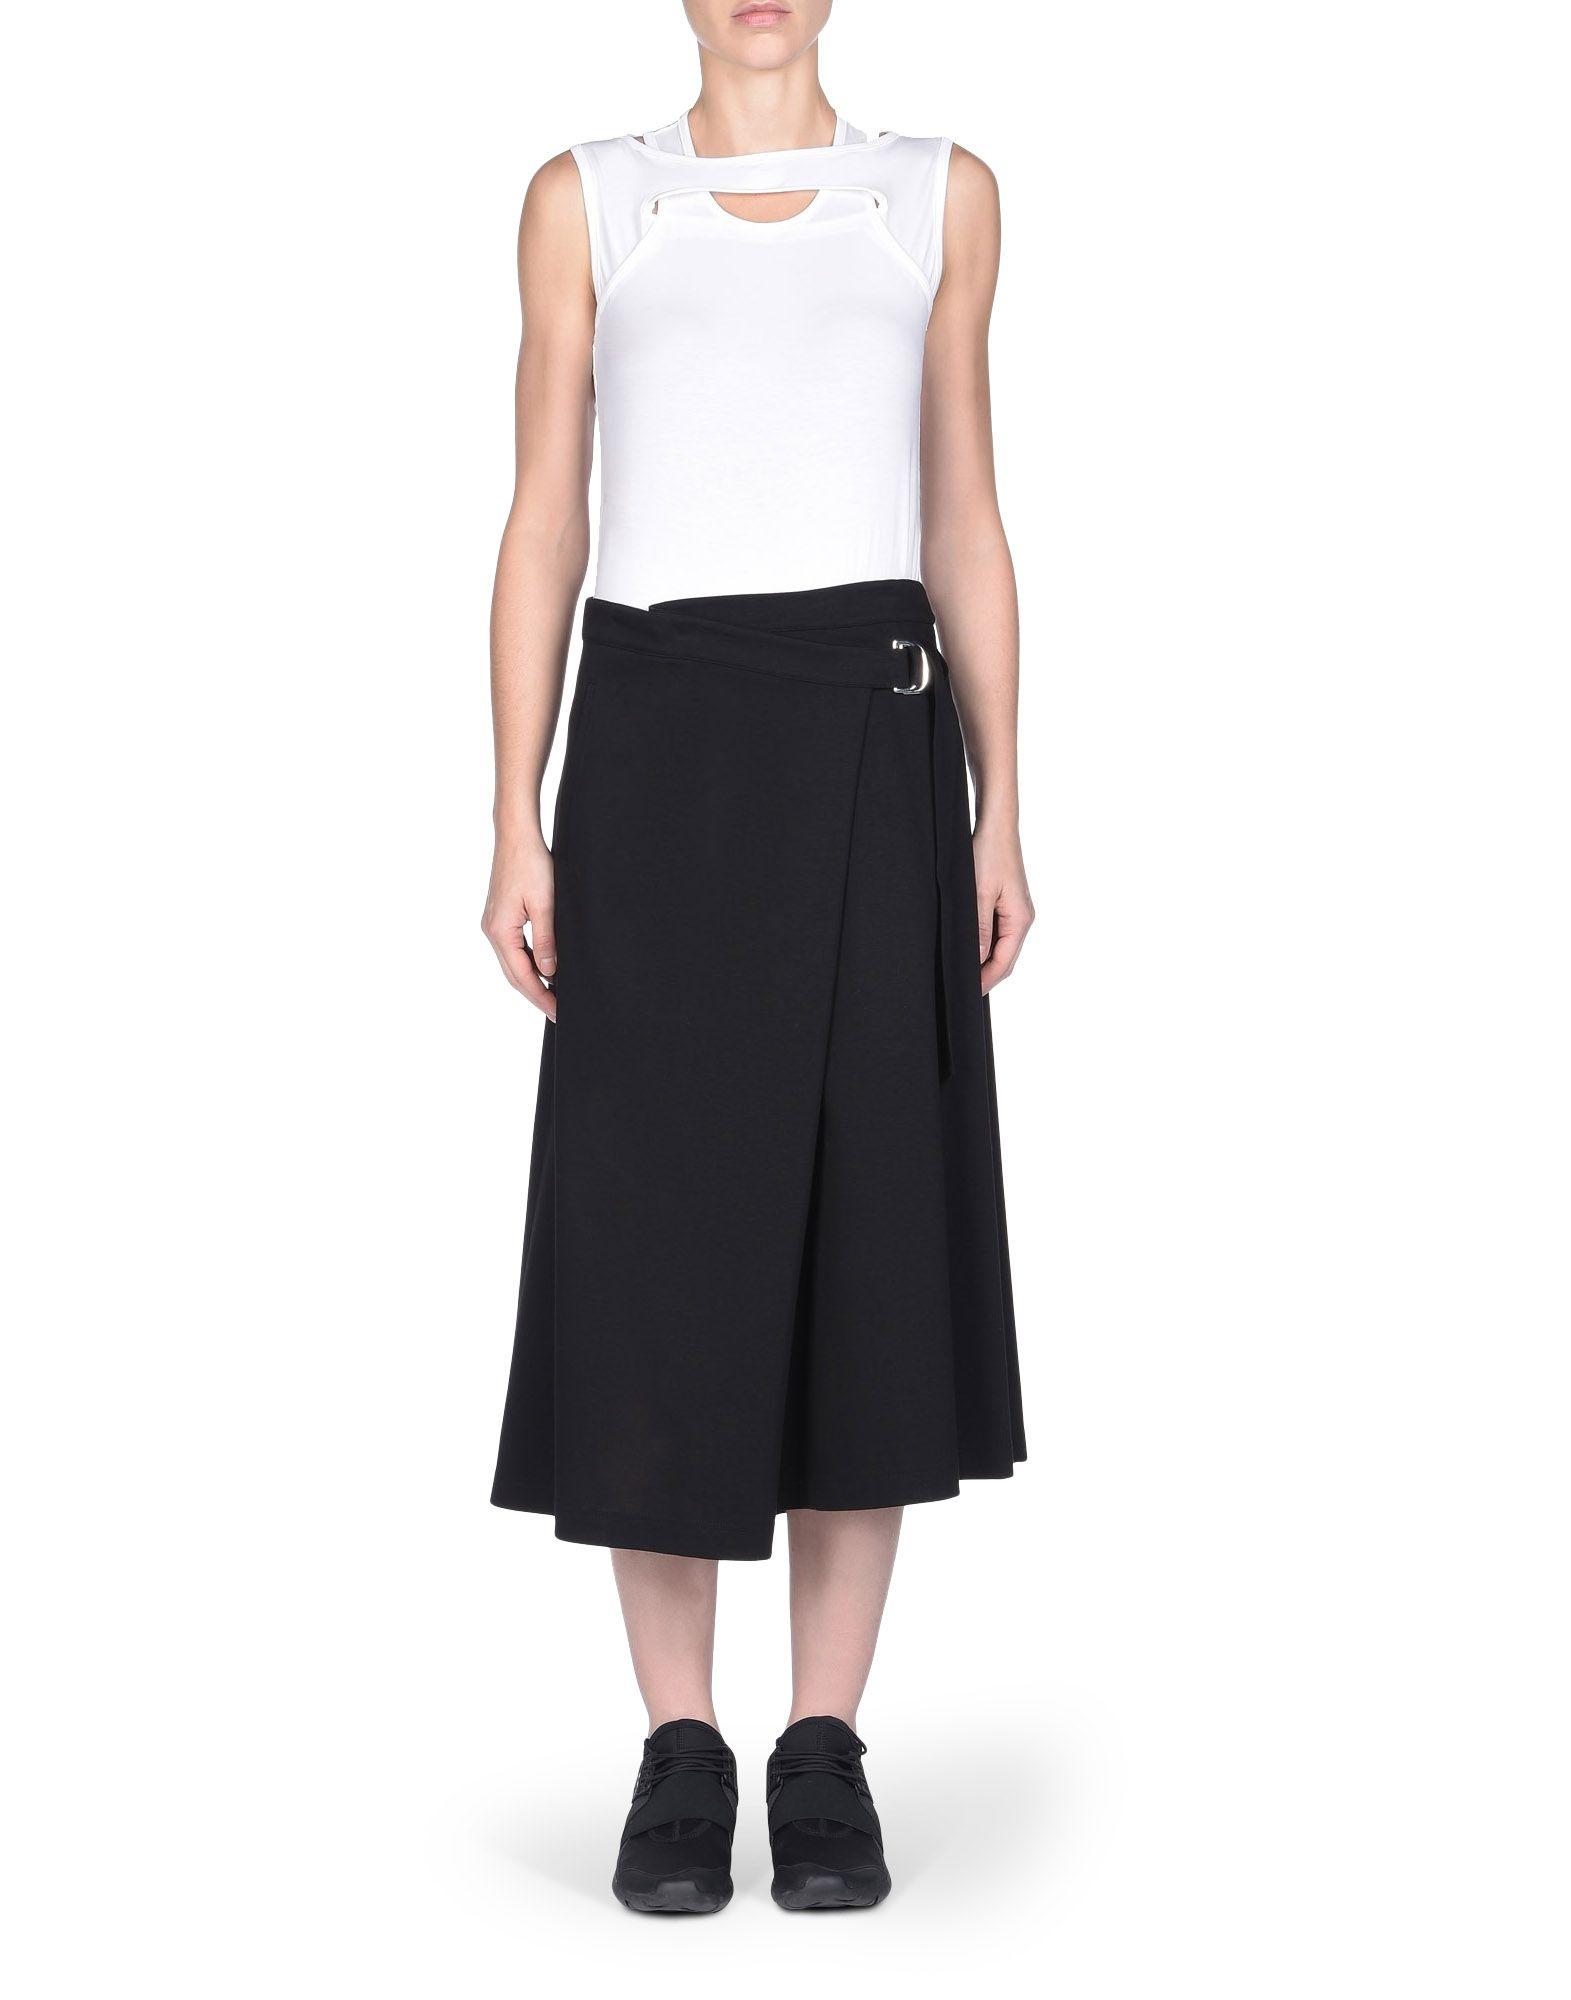 Y-3 LIGHT TRACK SKIRT DRESSES & SKIRTS woman Y-3 adidas